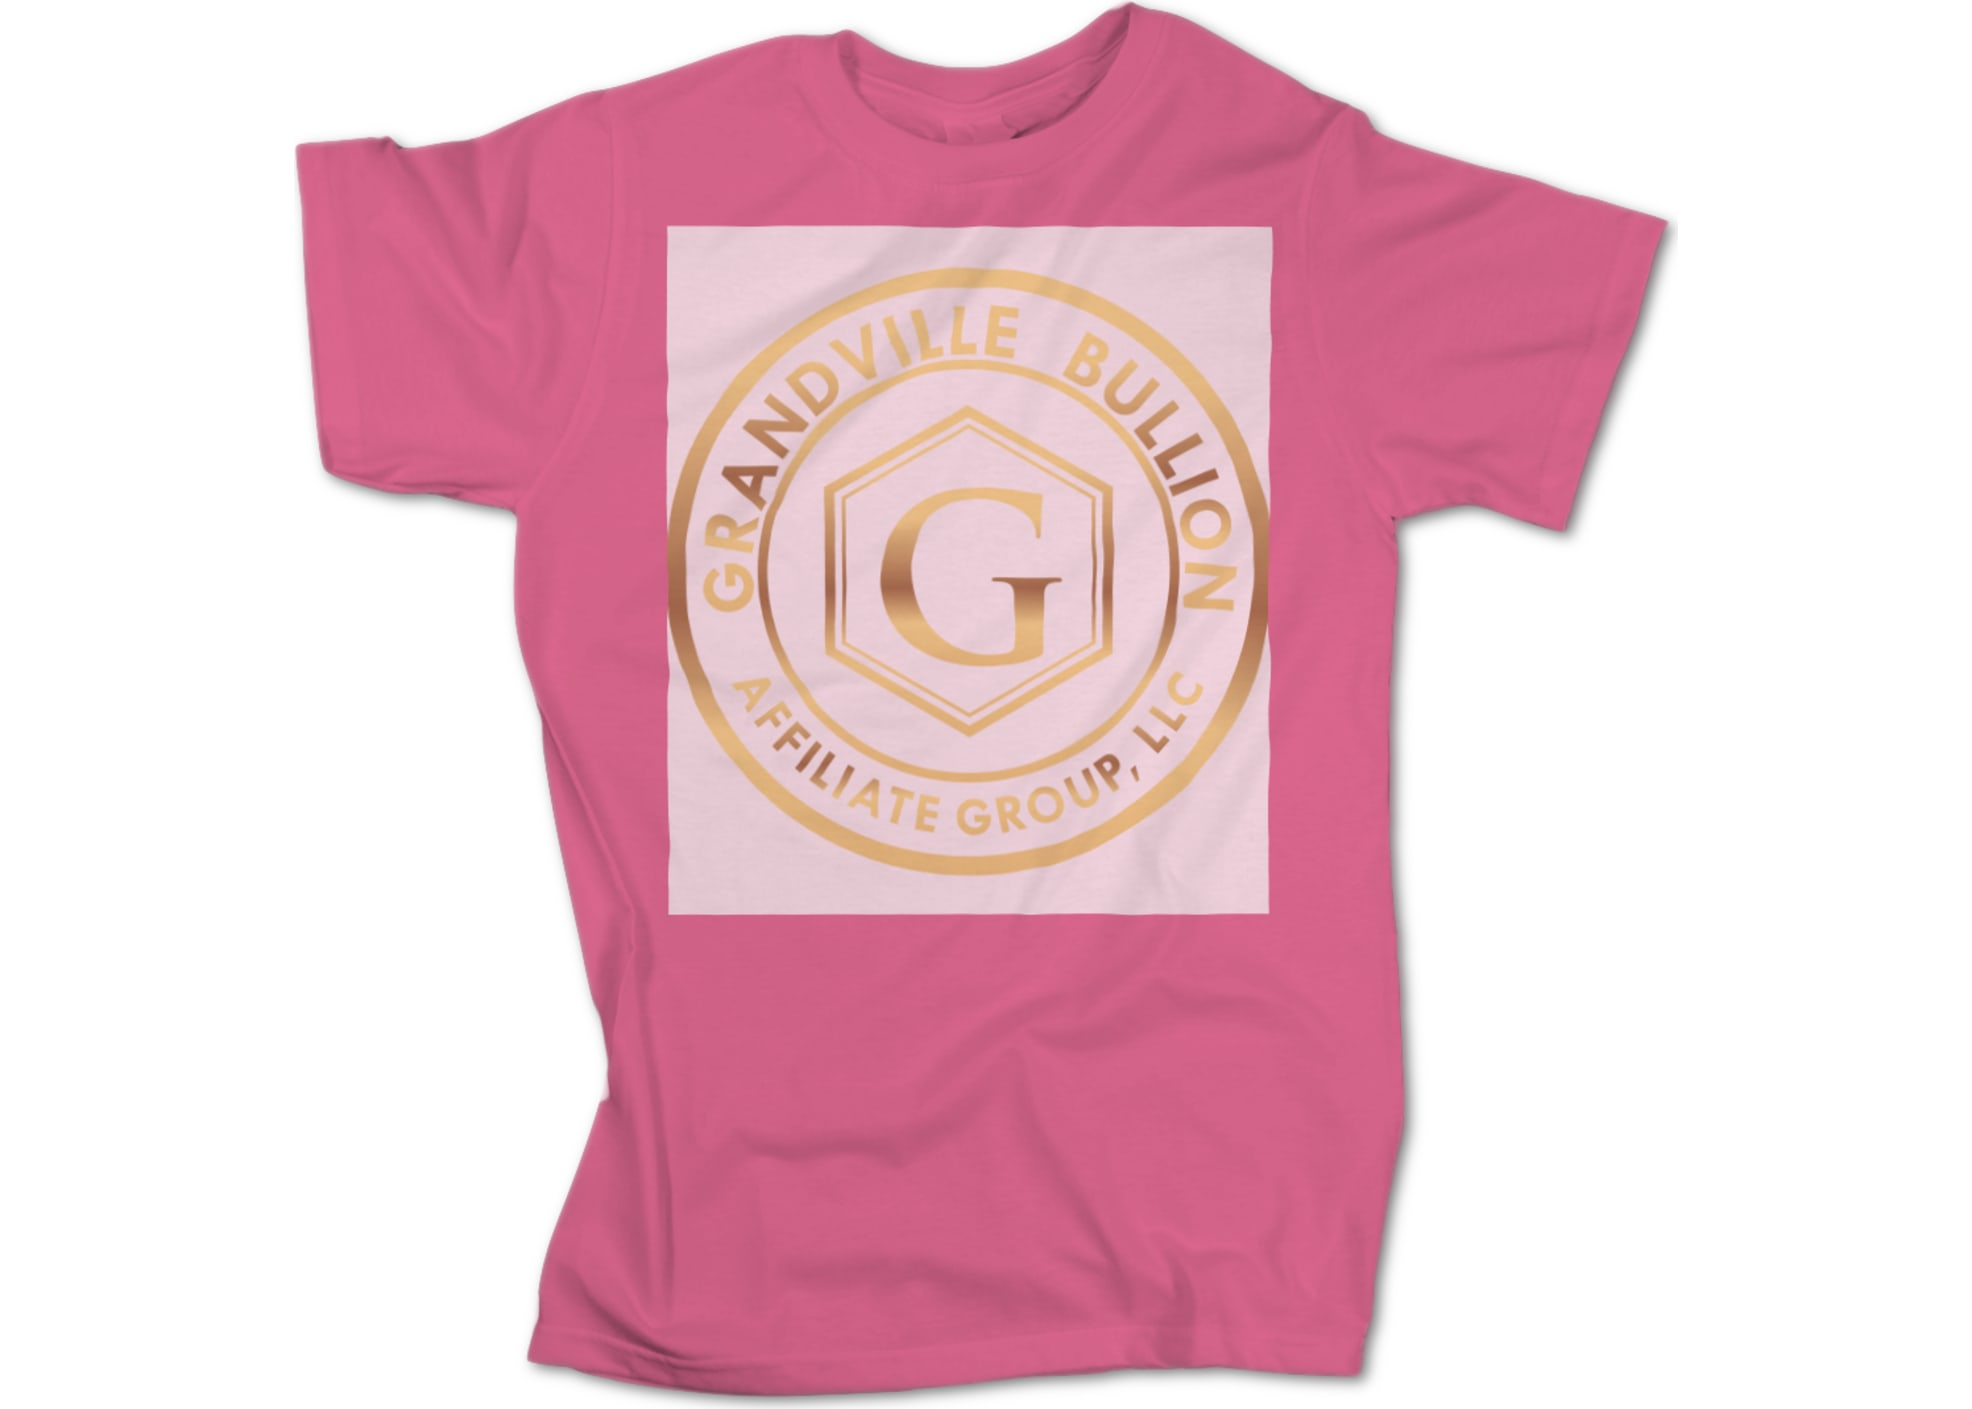 Grandville bullion group llc pink and gold  1629989663